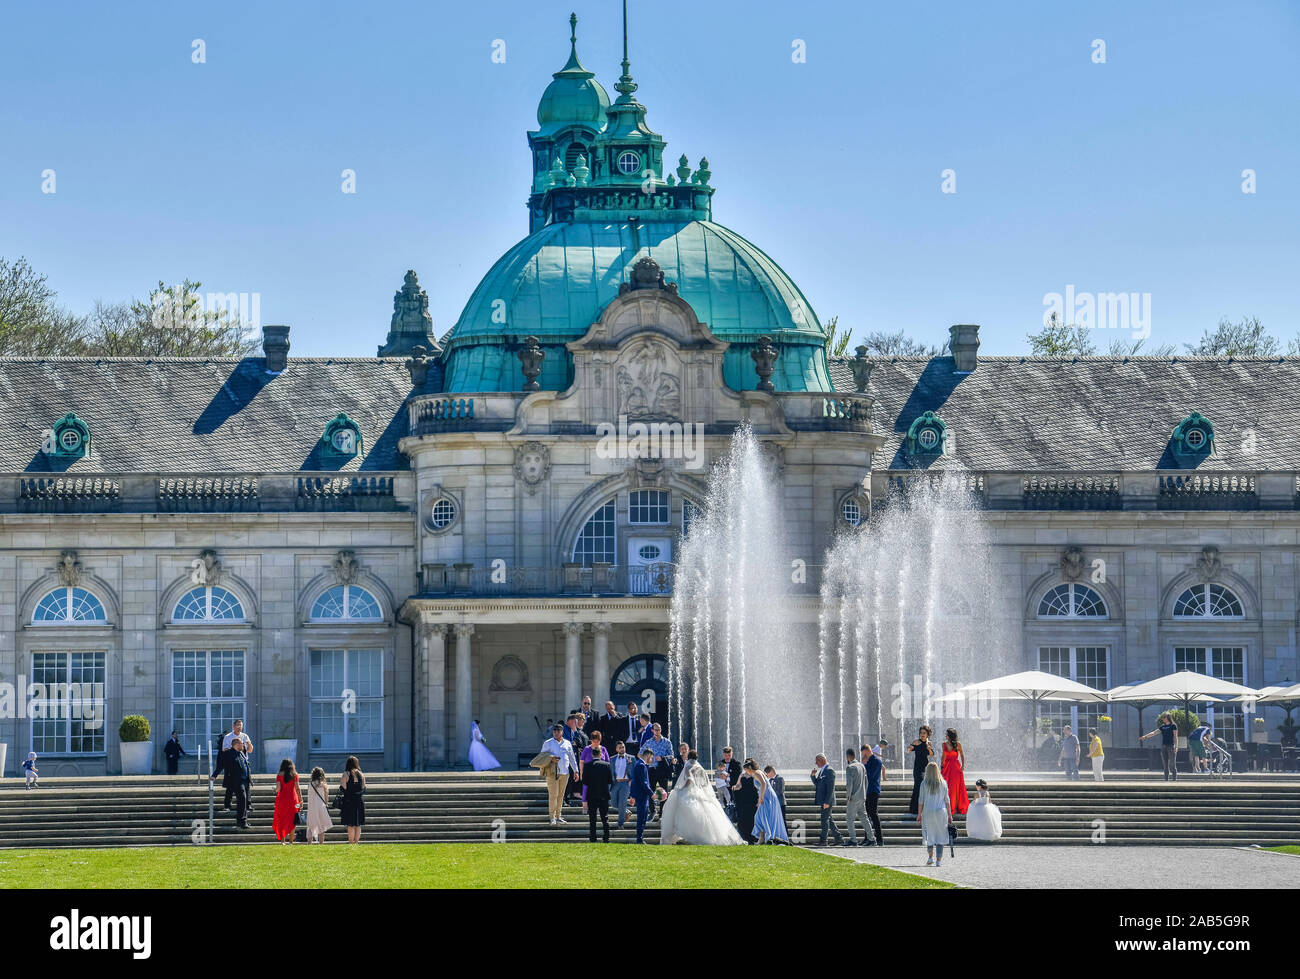 Kaiserpalais, Kurpark, Bad Oeynhausen, Nordrhein-Westfalen, Deutschland Stock Photo